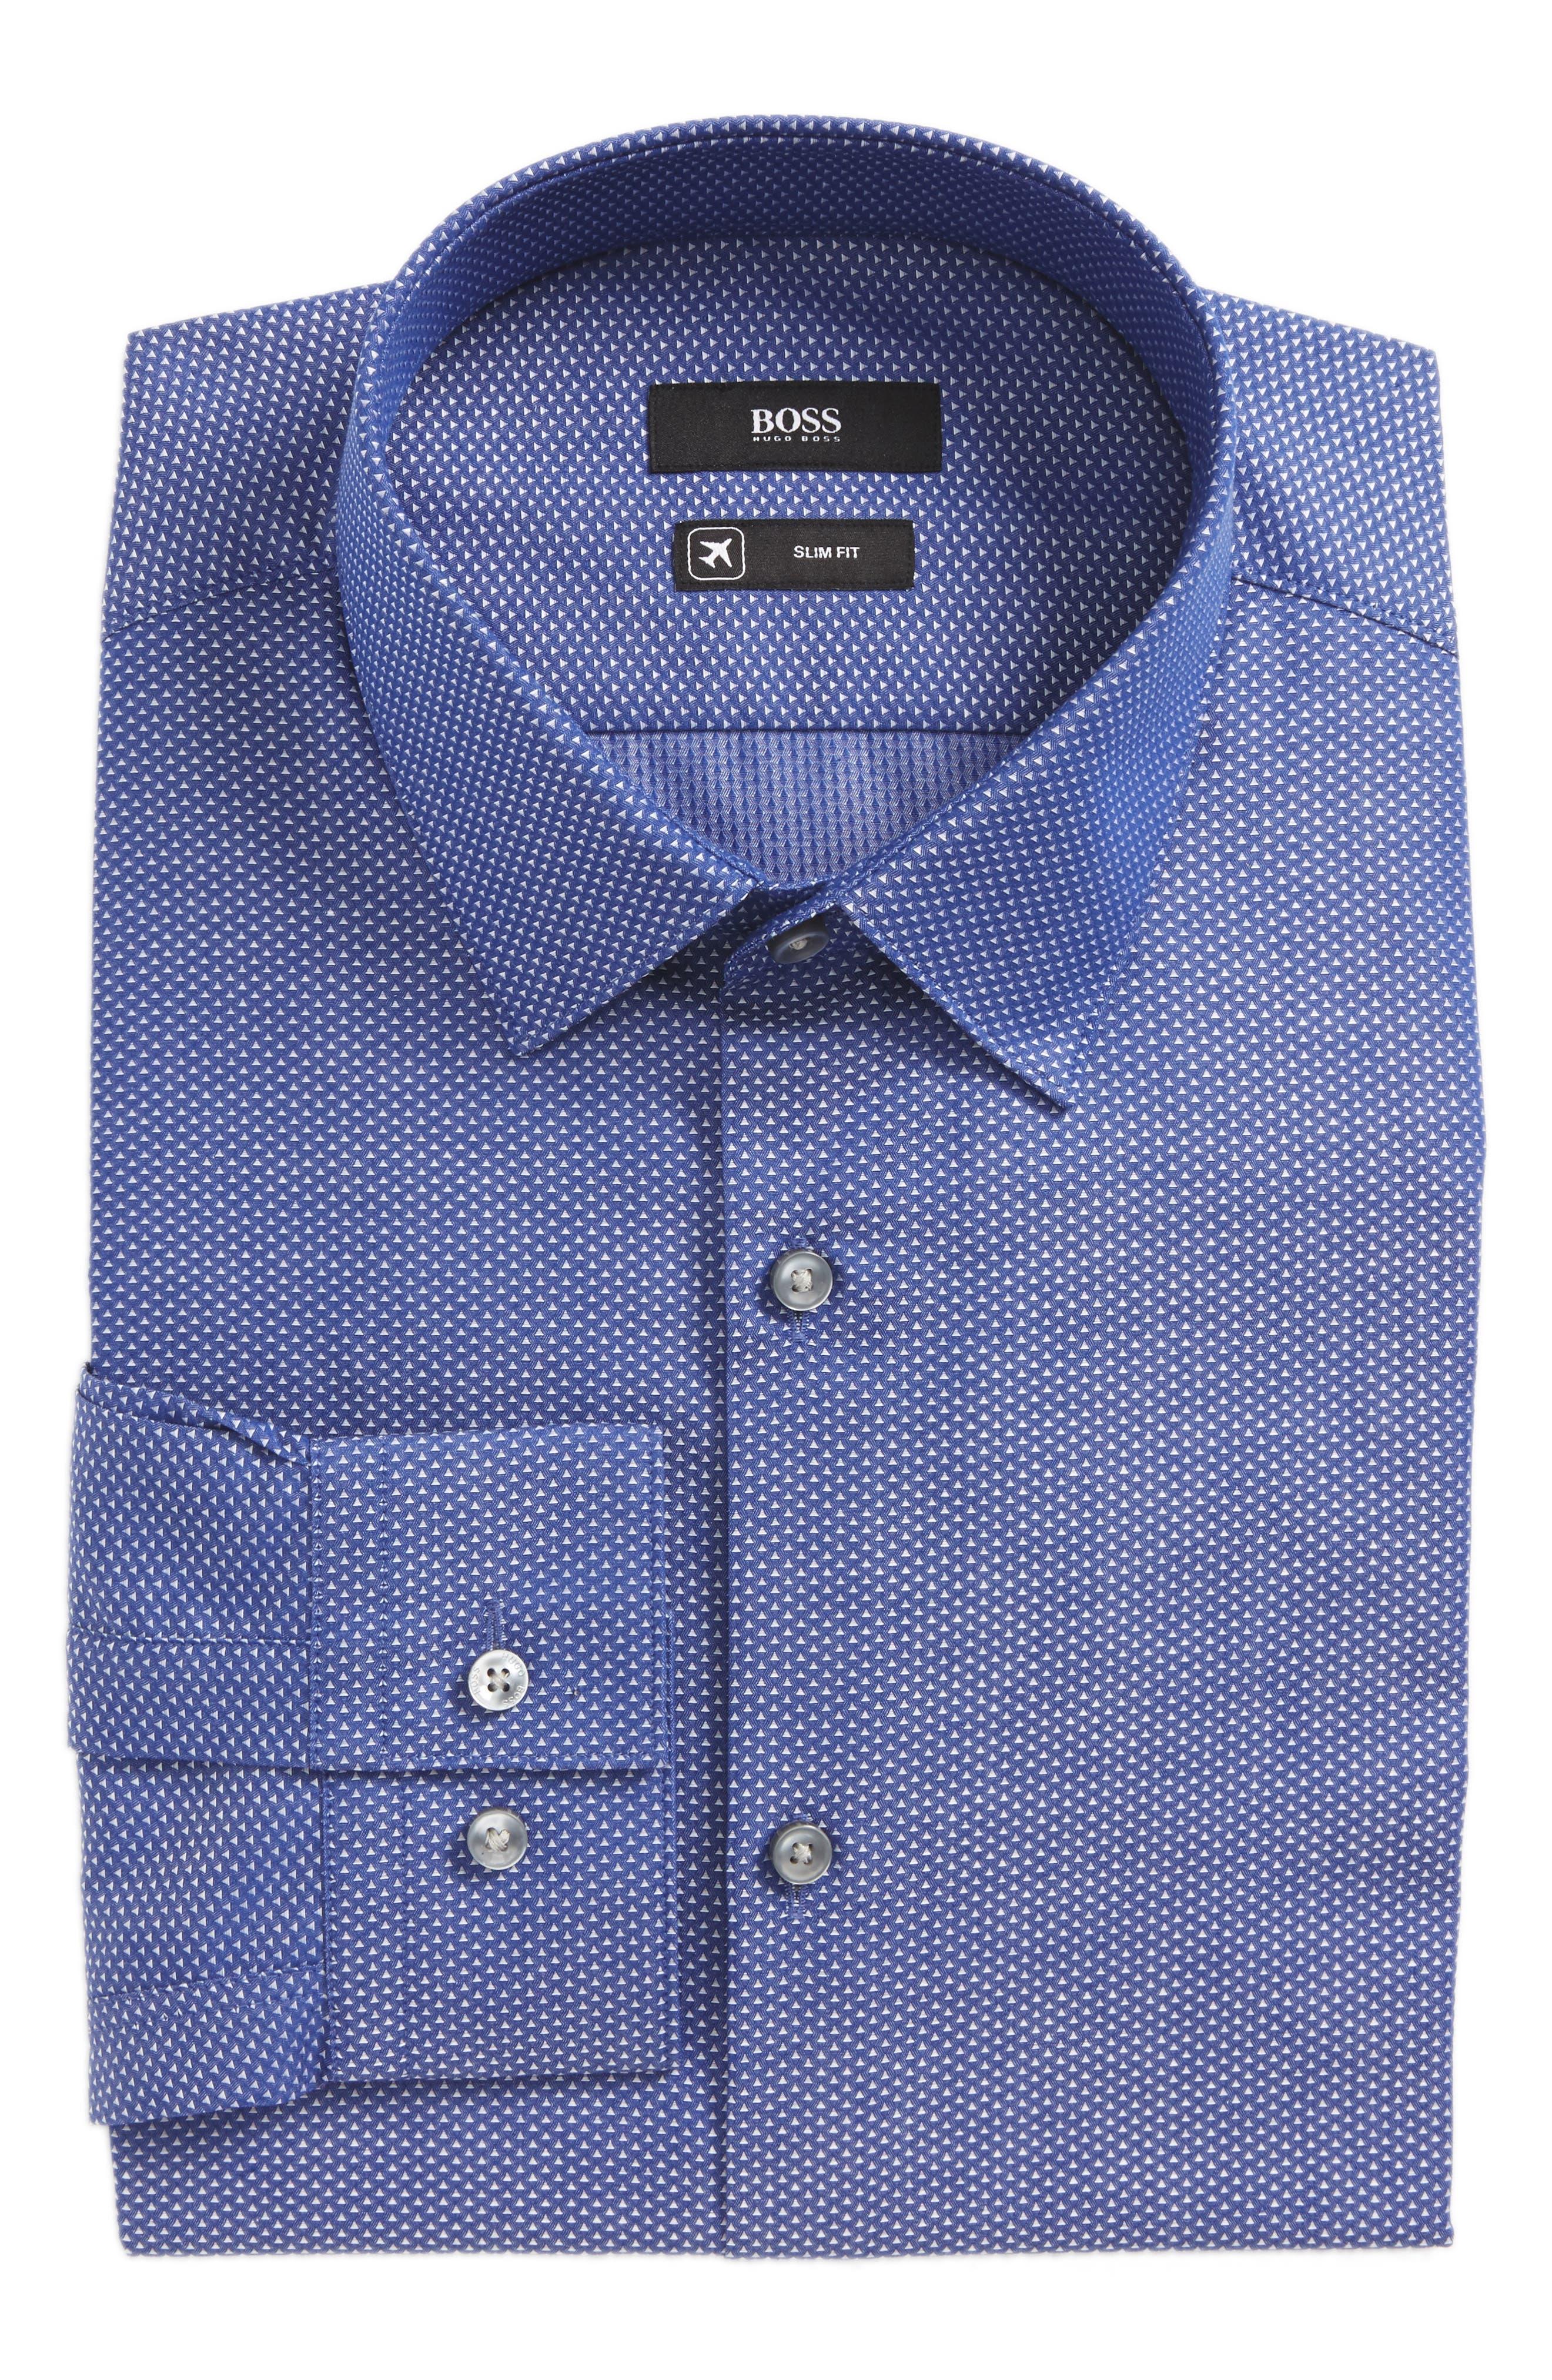 Isko Slim Fit Geometric Dress Shirt,                         Main,                         color, Blue